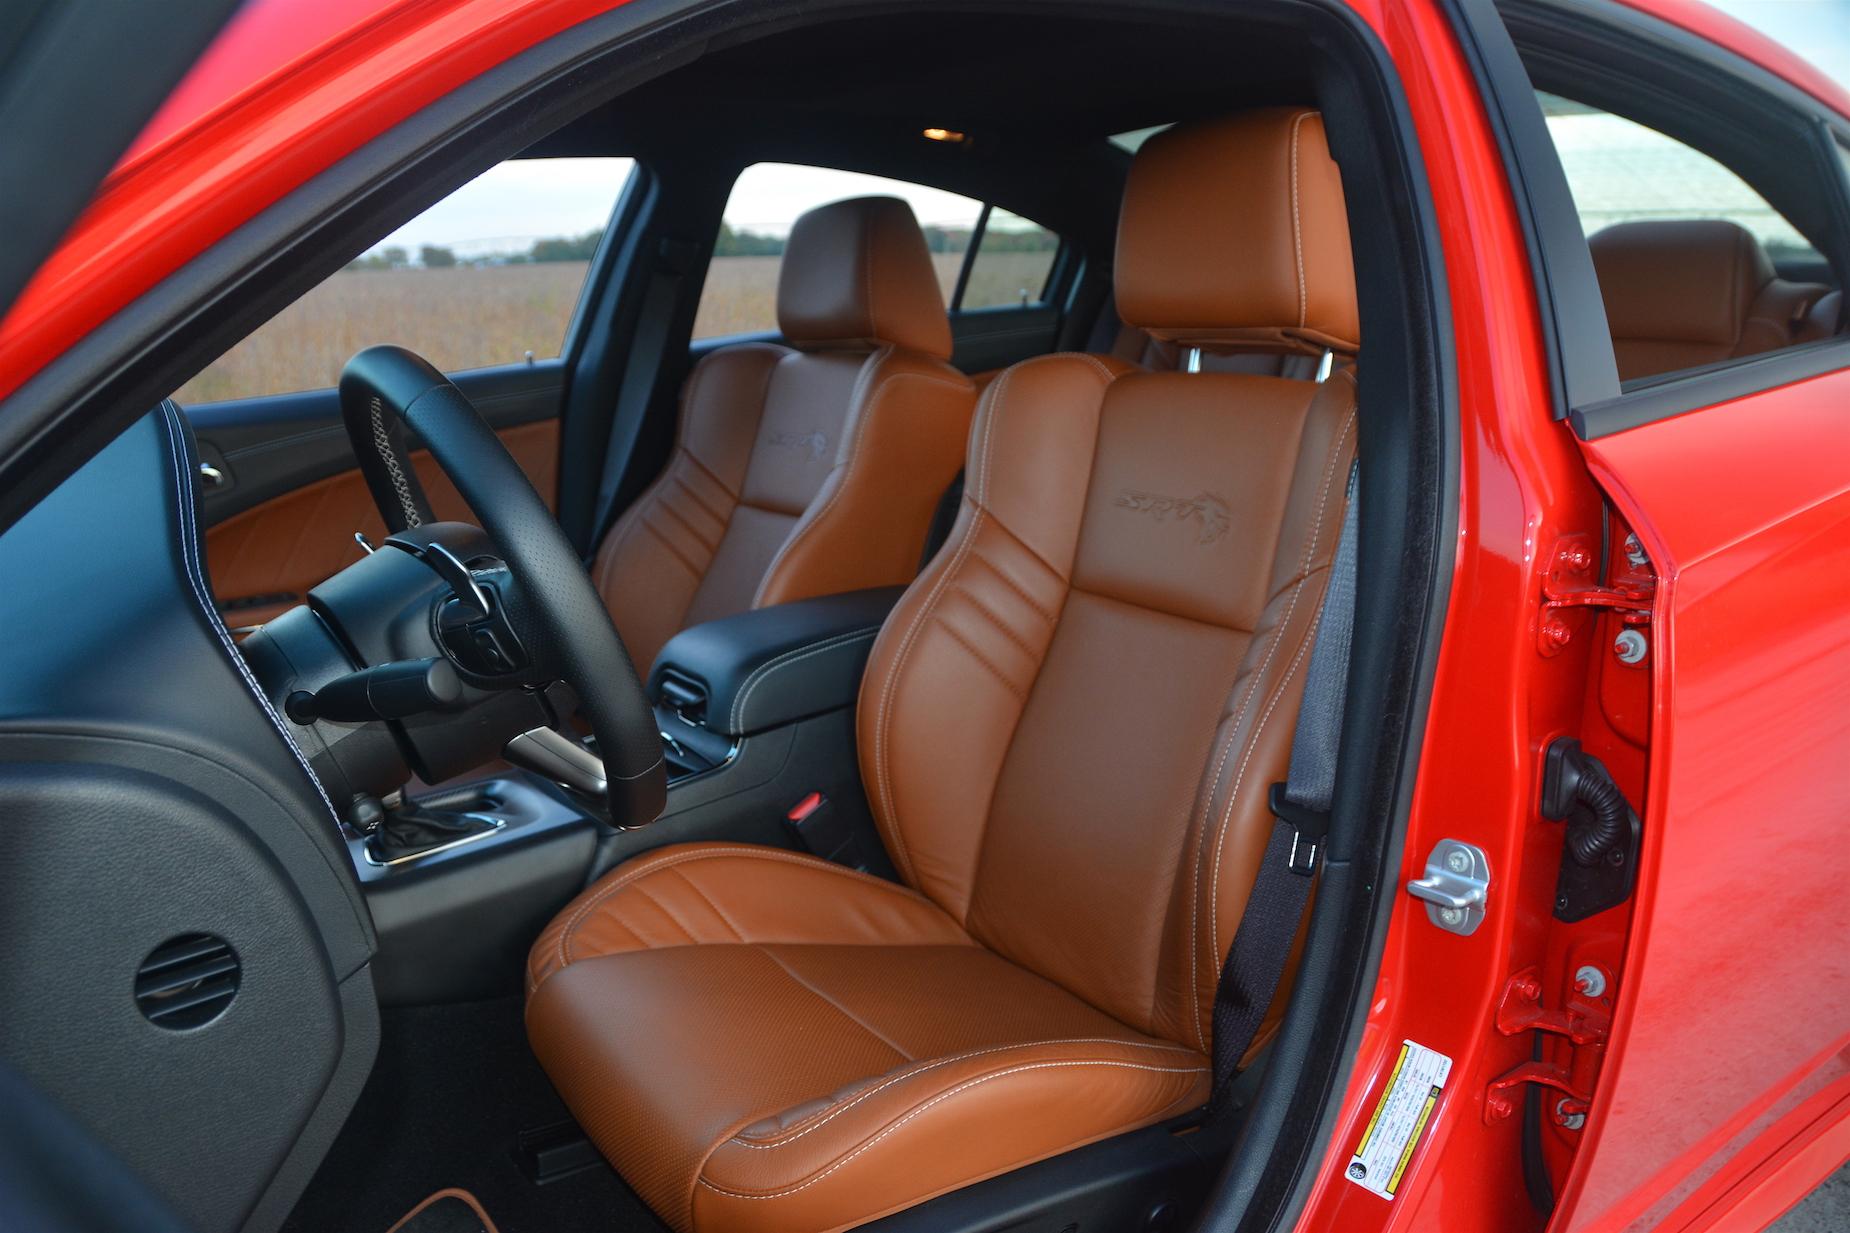 Dodge Charger SRT Hellcat Widebody Seats